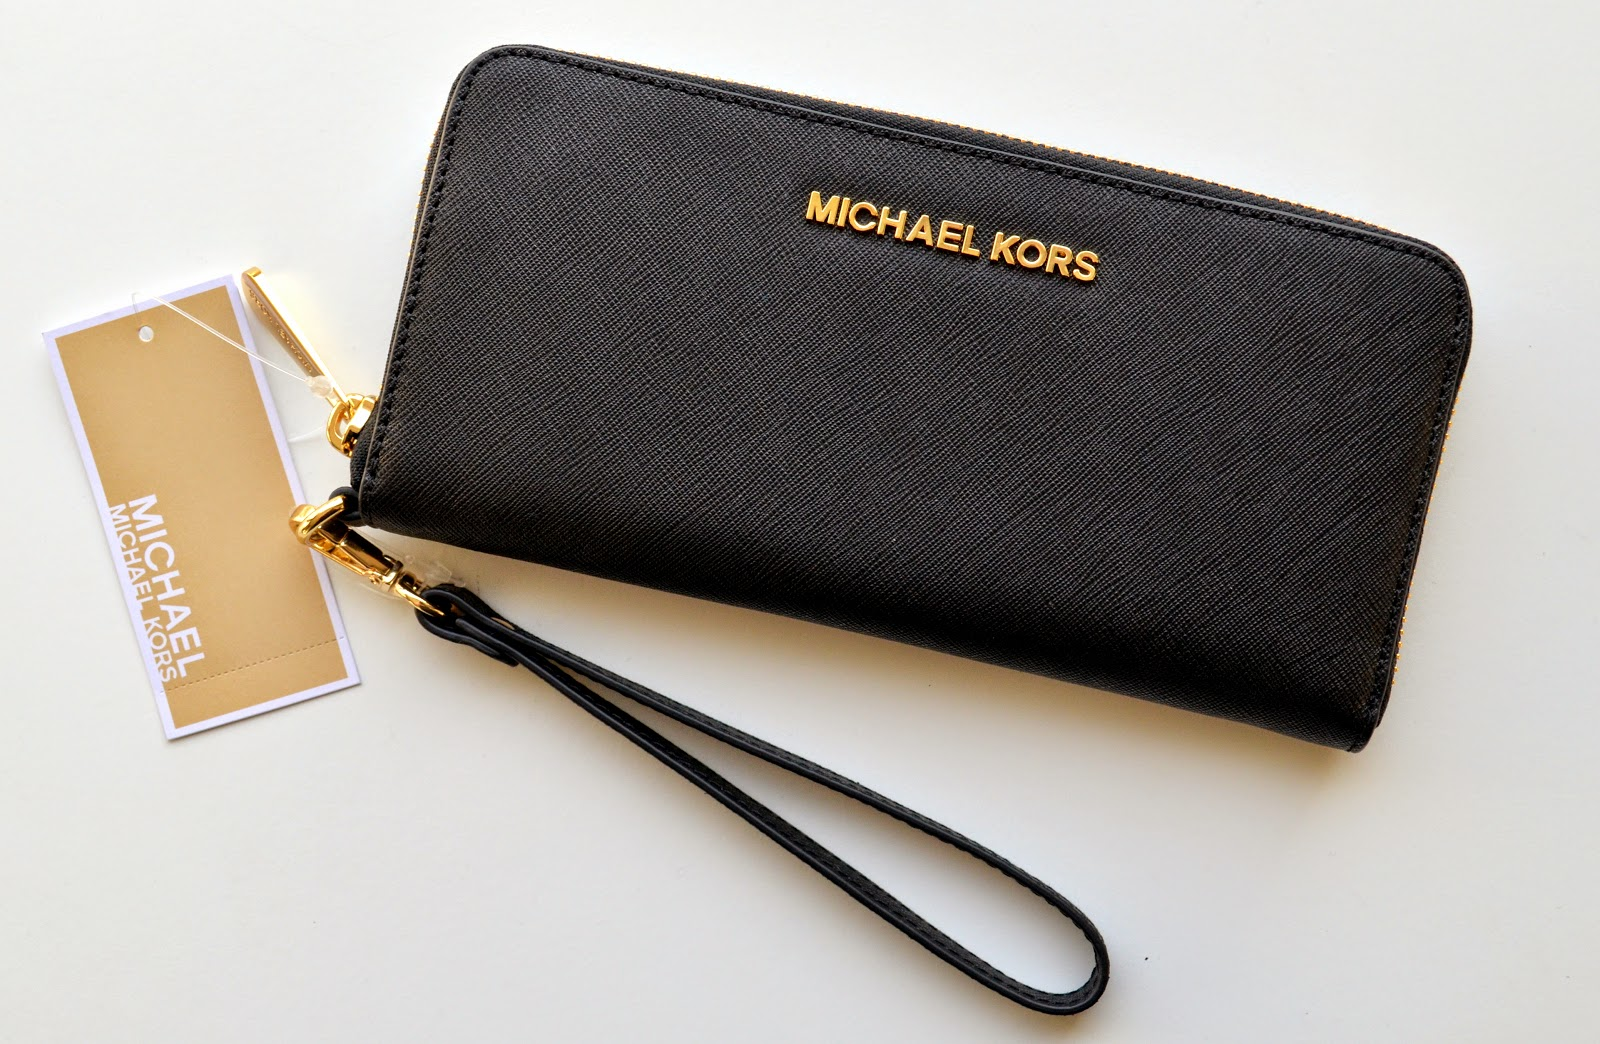 1eba5c2786d Michael kors tas en portemonnee | ecin.mortlod.nl